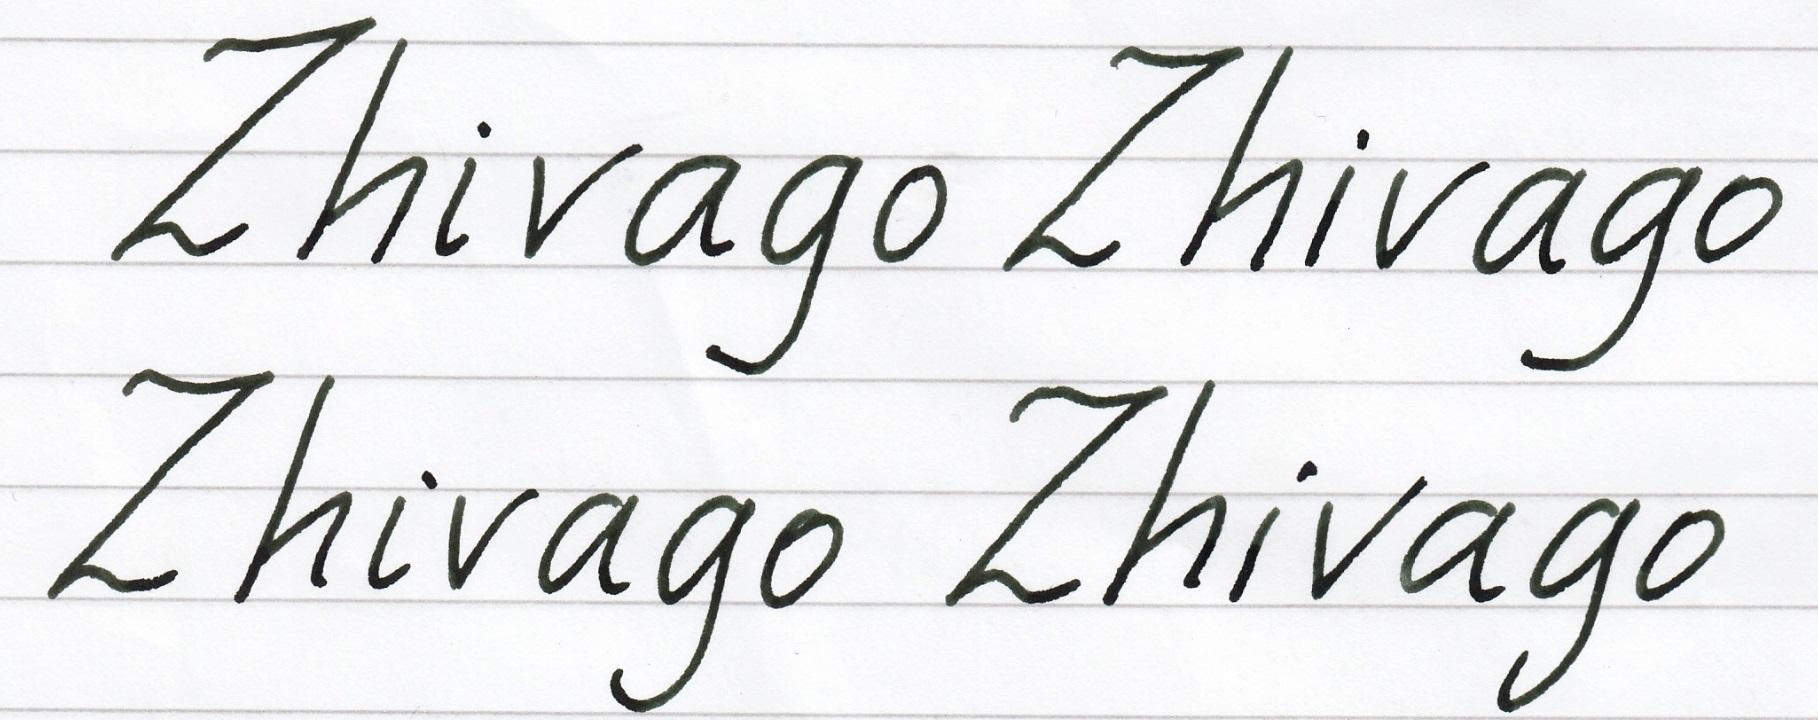 fpn_1453636408__zhivago_lyreco_3.jpg